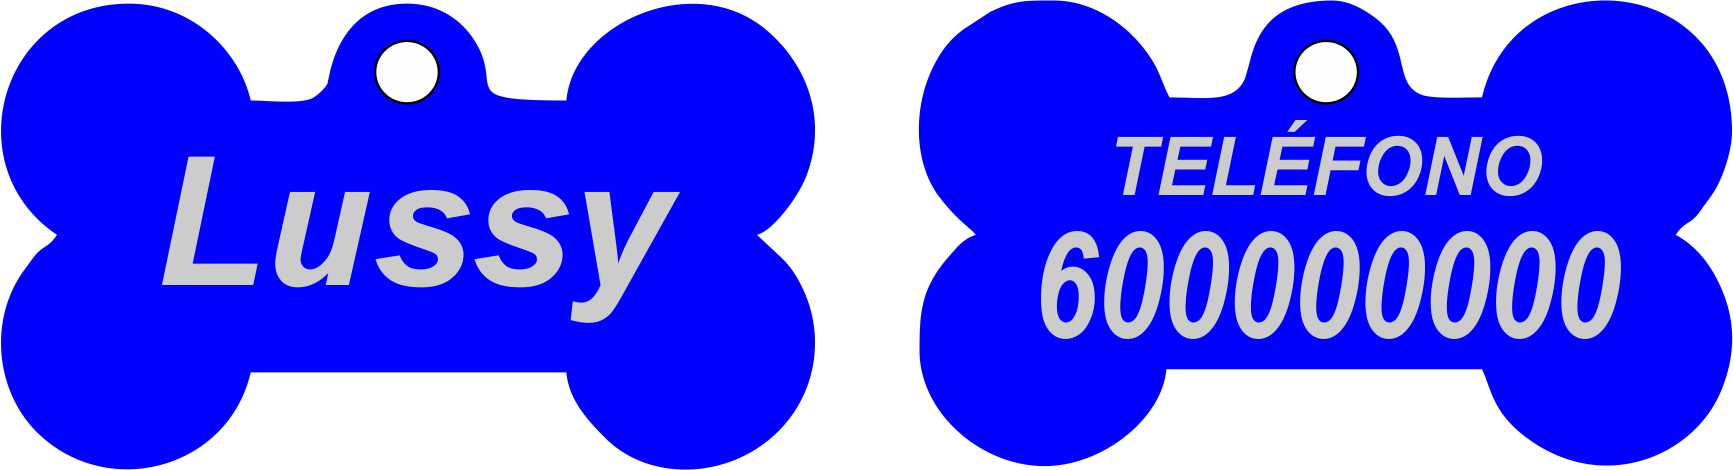 Chapa Para Perro Azul 24 mm 42 mm Aluminio Azul 18 mm 32 mm Aluminio